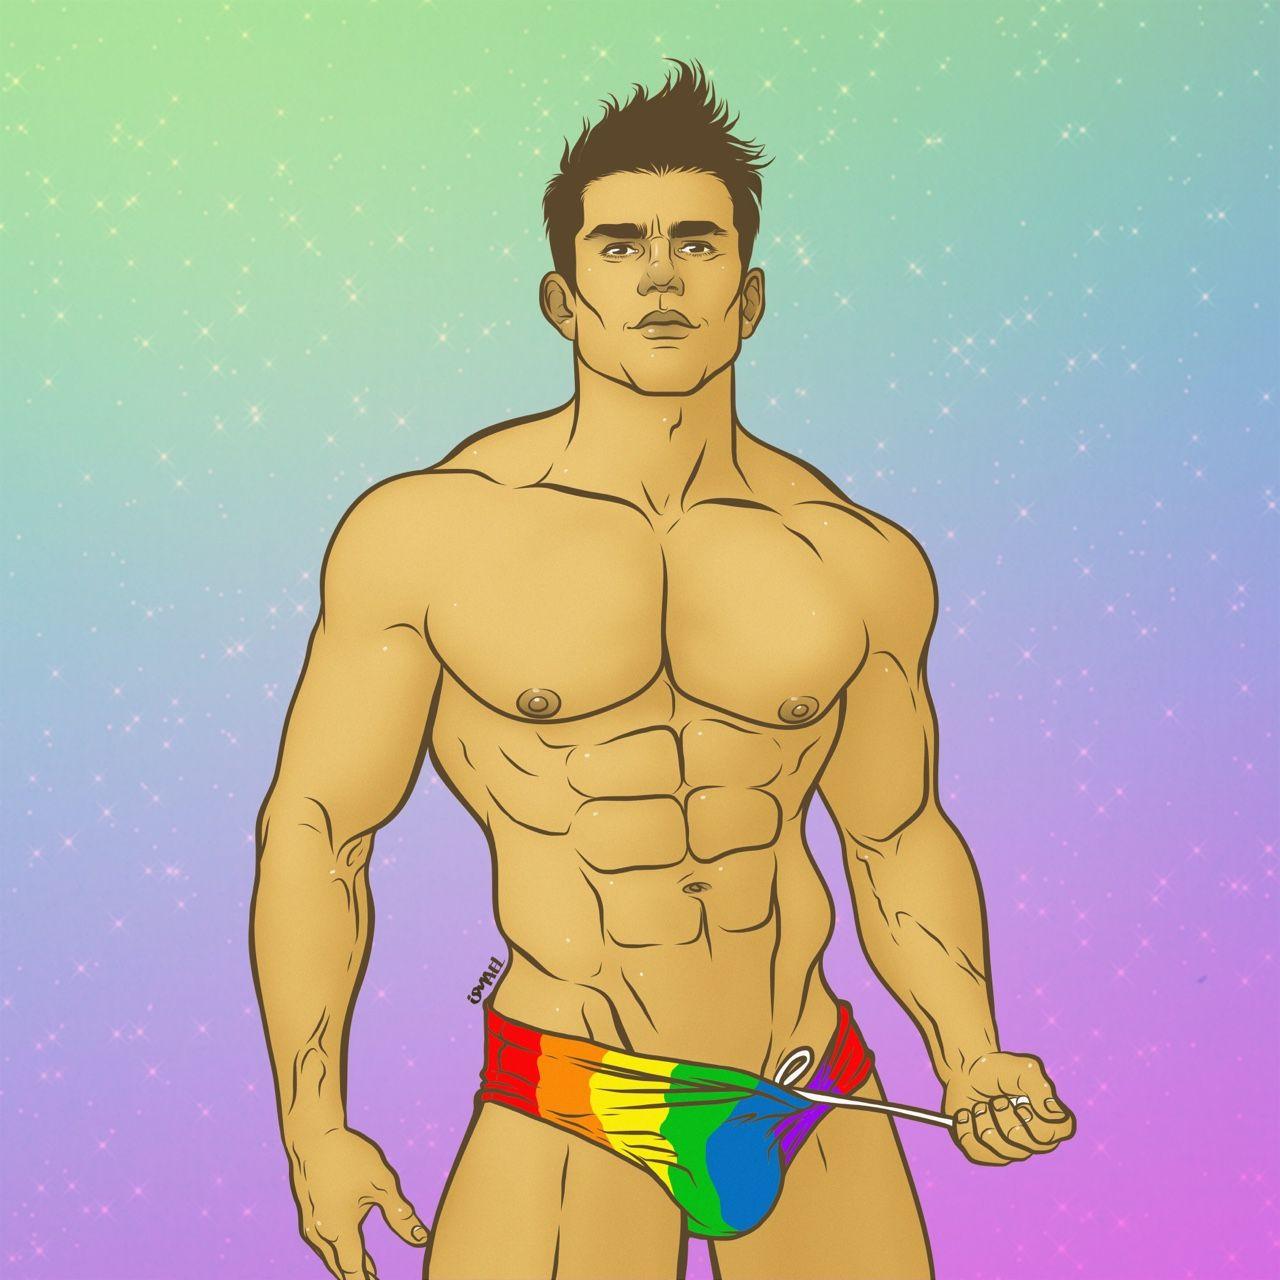 Ismael alvarez arte gay twitter